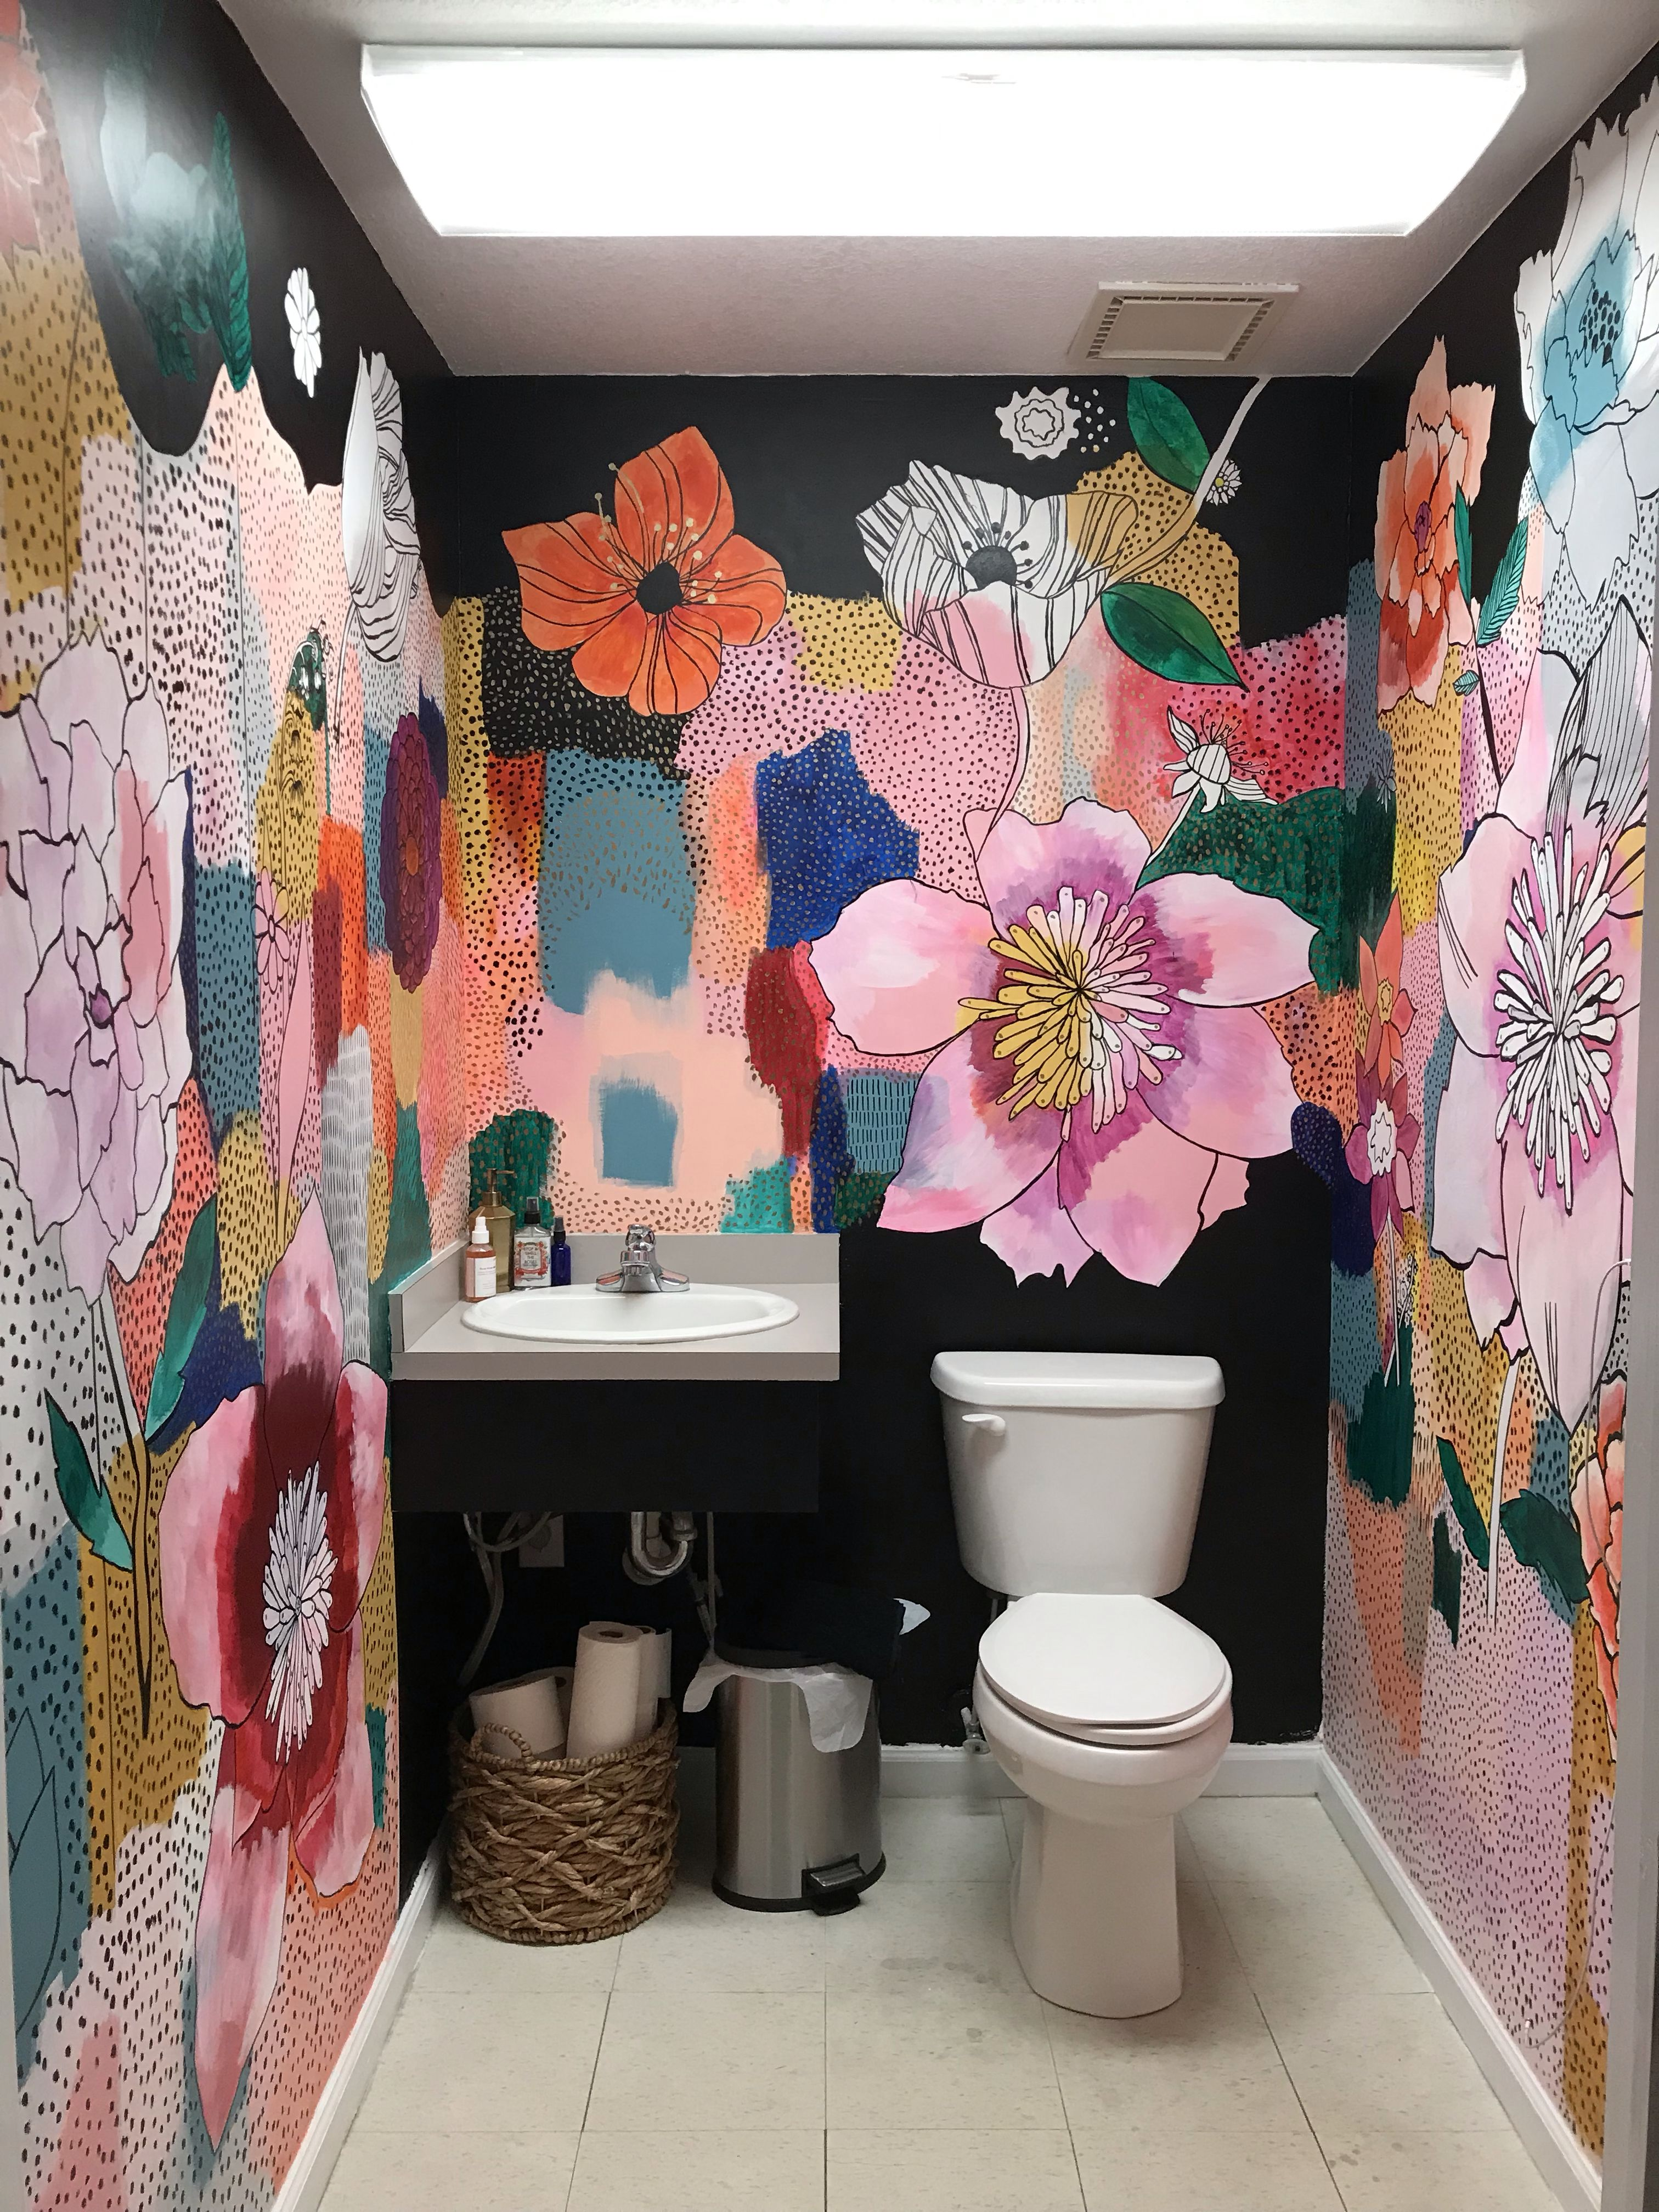 Floral Mural In Bathroom Bathroom Mural Wall Painting Decor Bathroom Decor